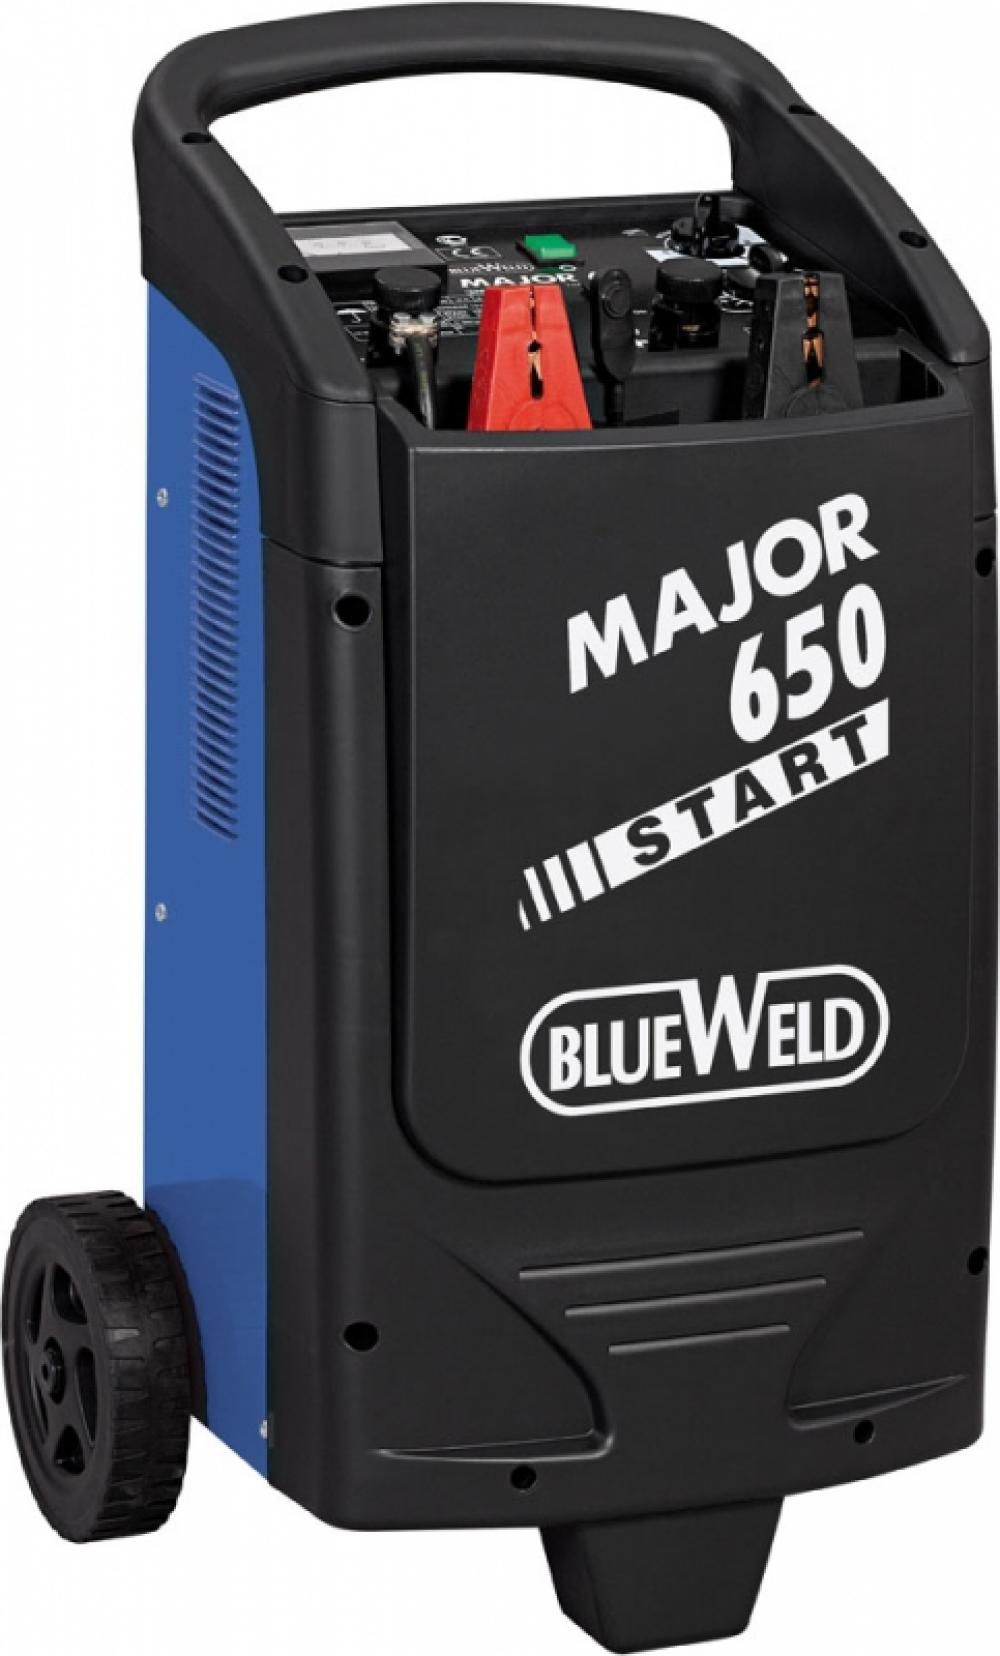 Blueweld Major 650